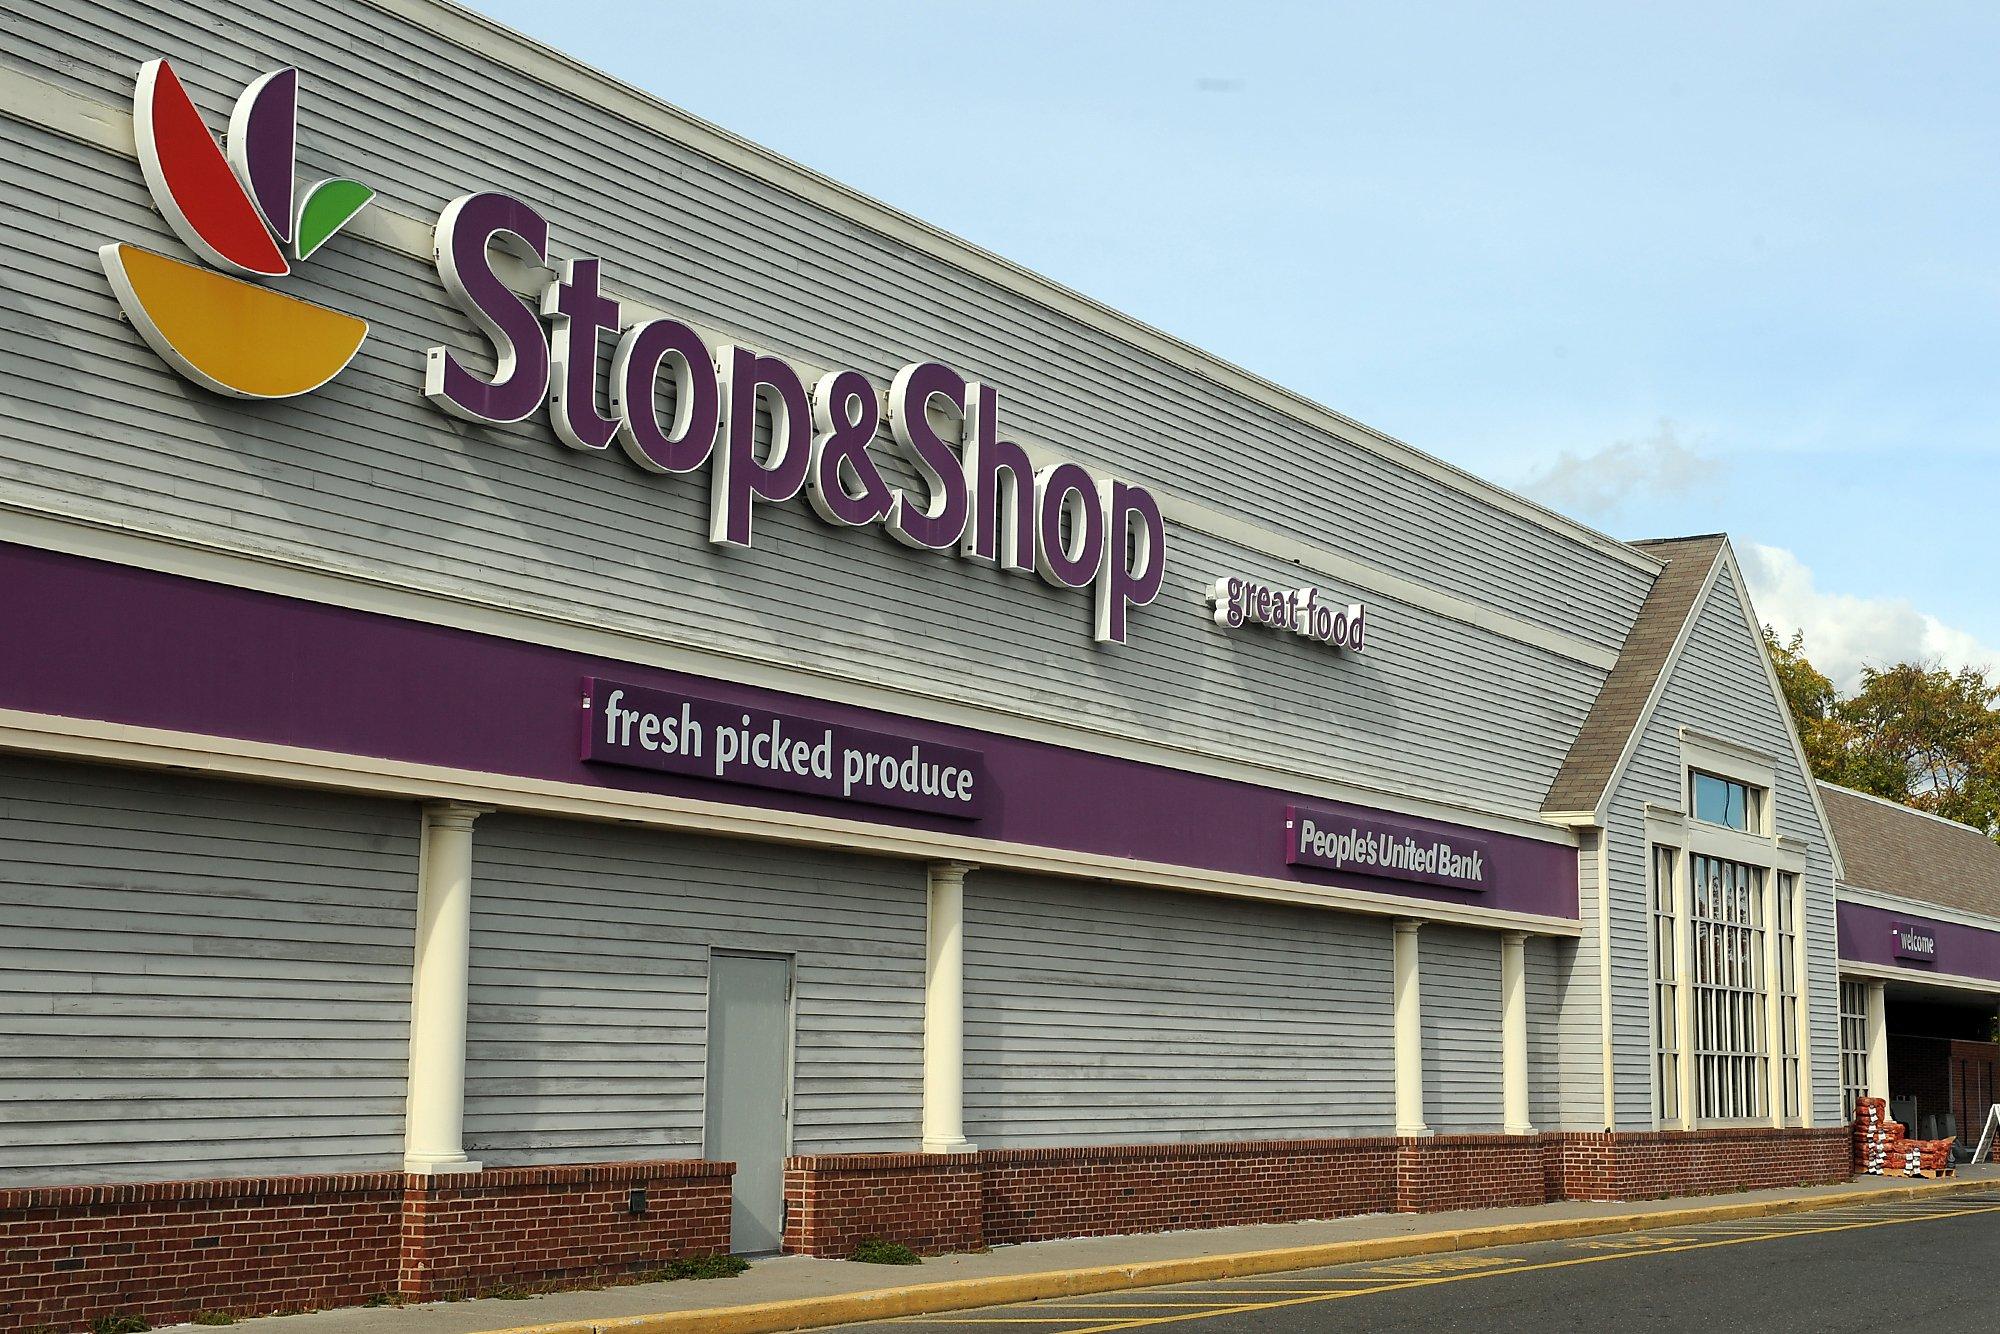 Fairfield Stop Amp Shop Launches Online Pickup Service San